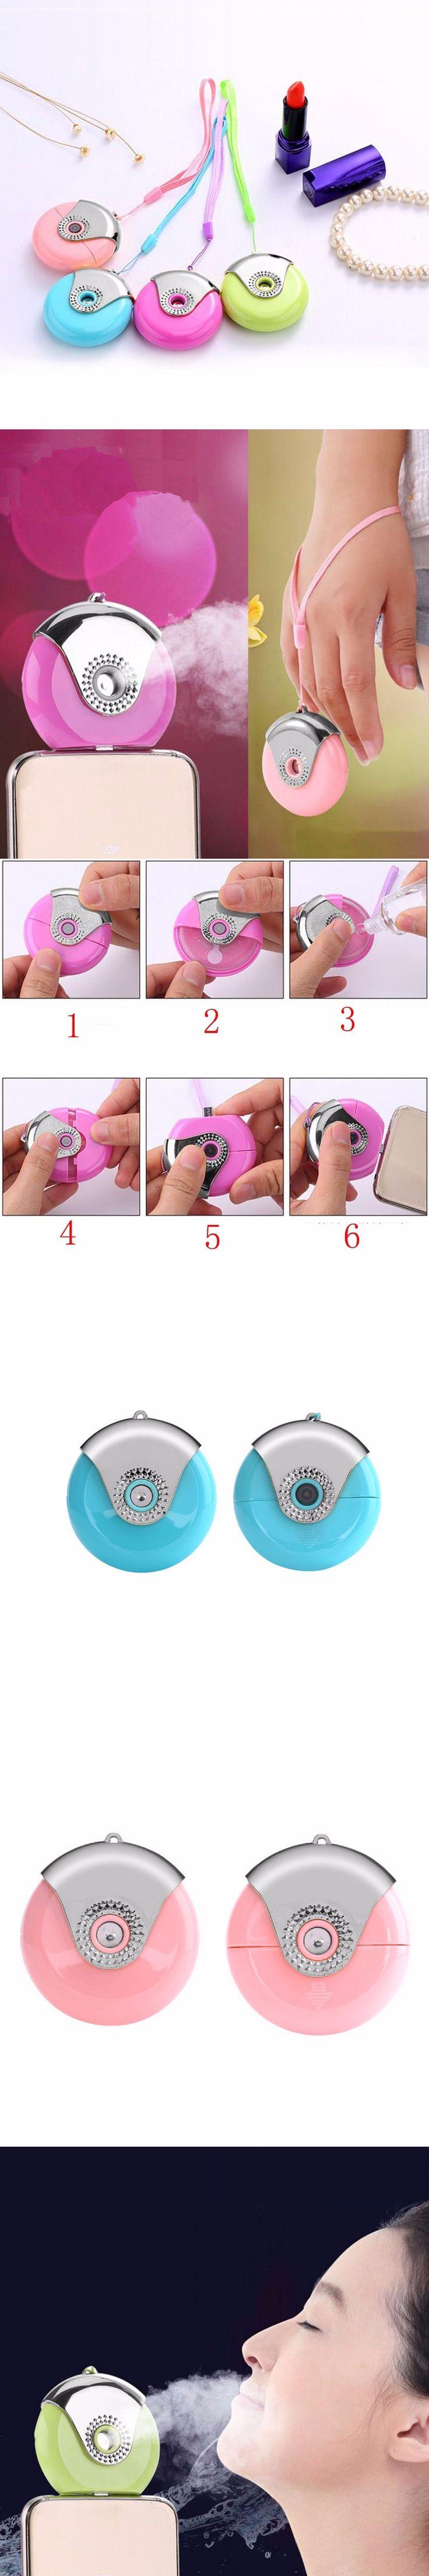 2 PCS/lot Mini Humidifier USB Charging For iPhone/Android Nano Mist Handy Atomization Facial Moisturizing Spray